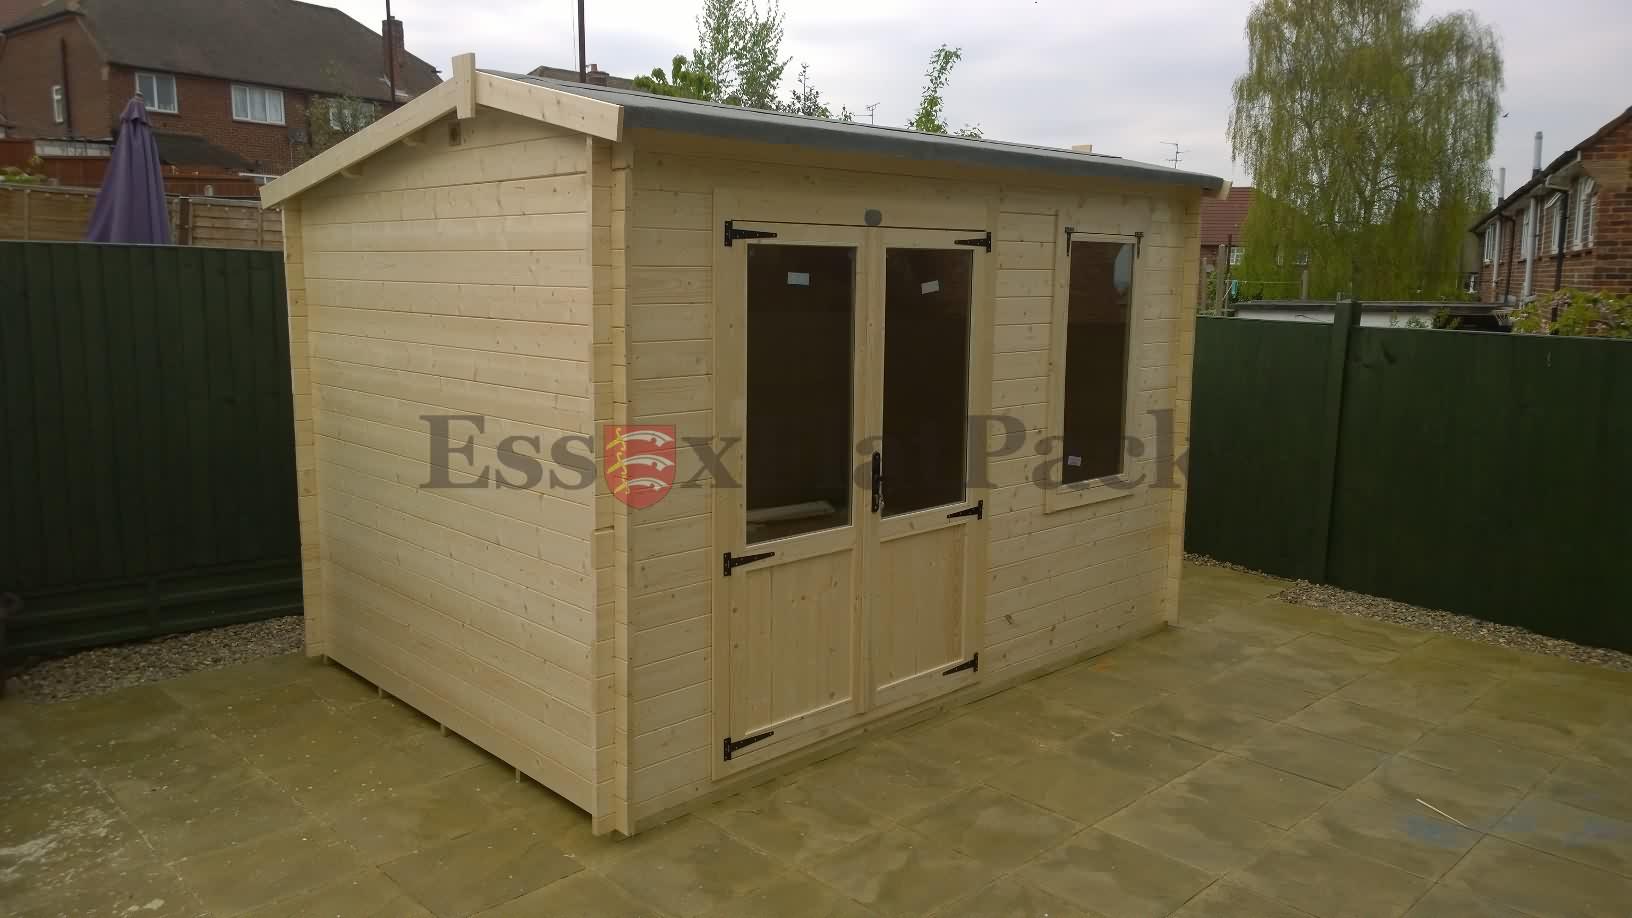 essexflatpack-log-cabins-20170420154204.jpg